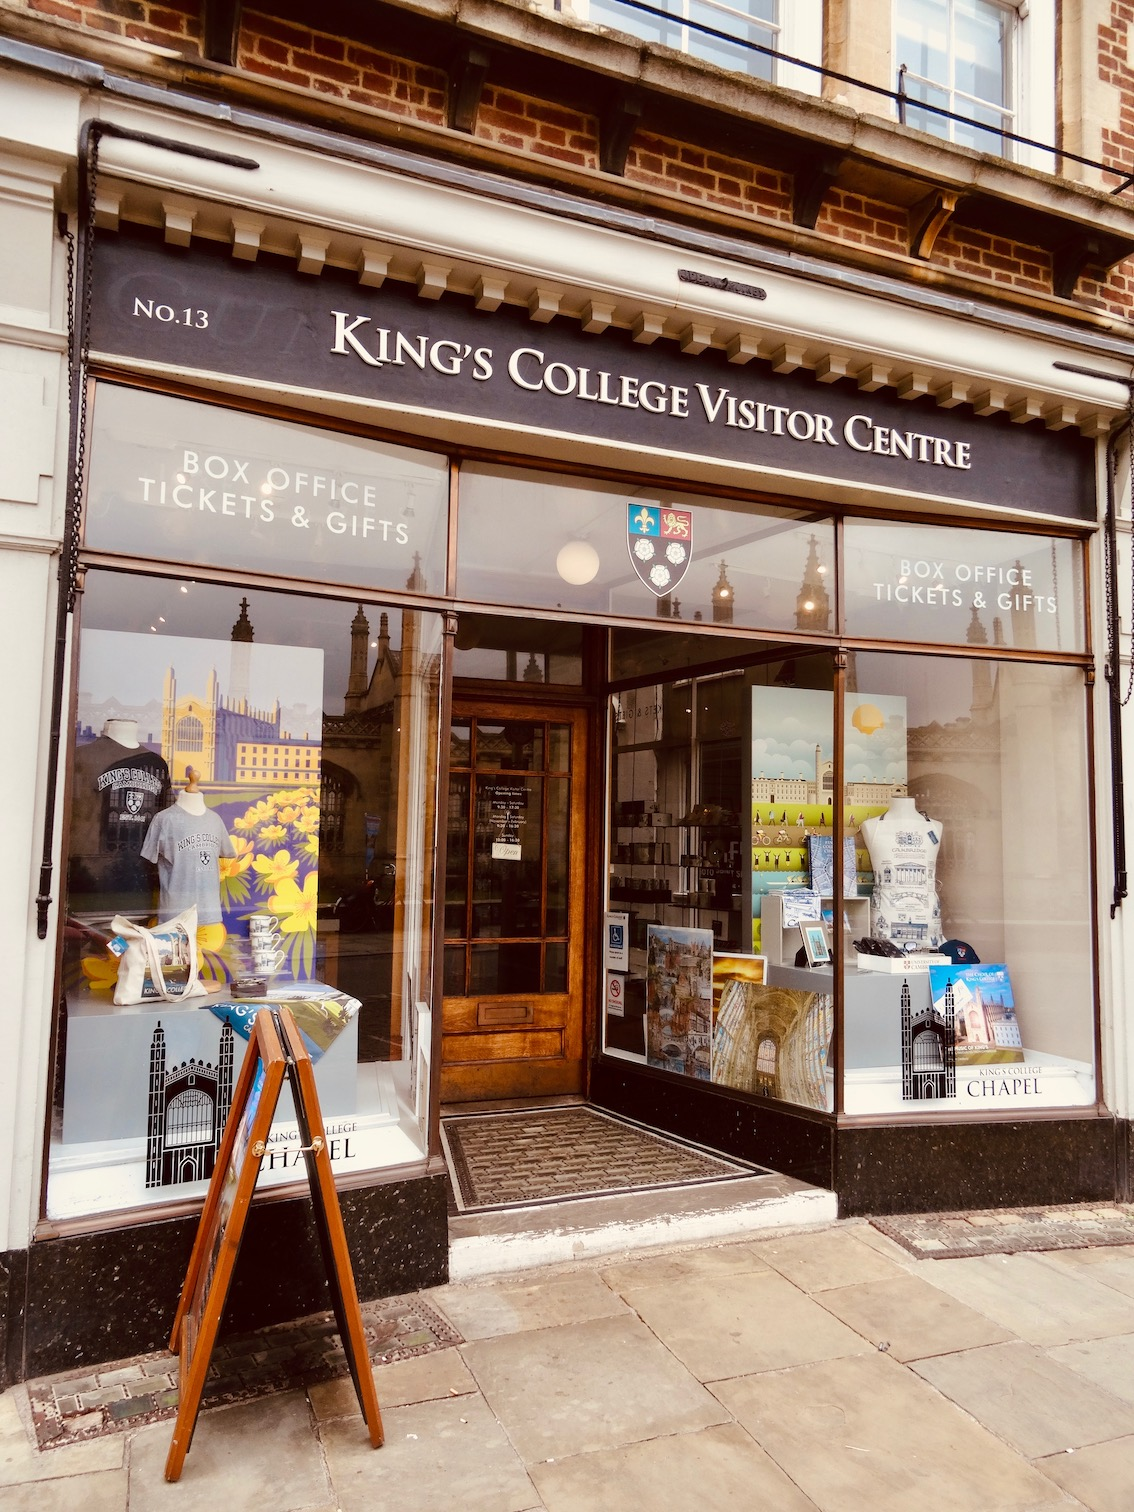 King's College Visitor Centre Cambridge England.